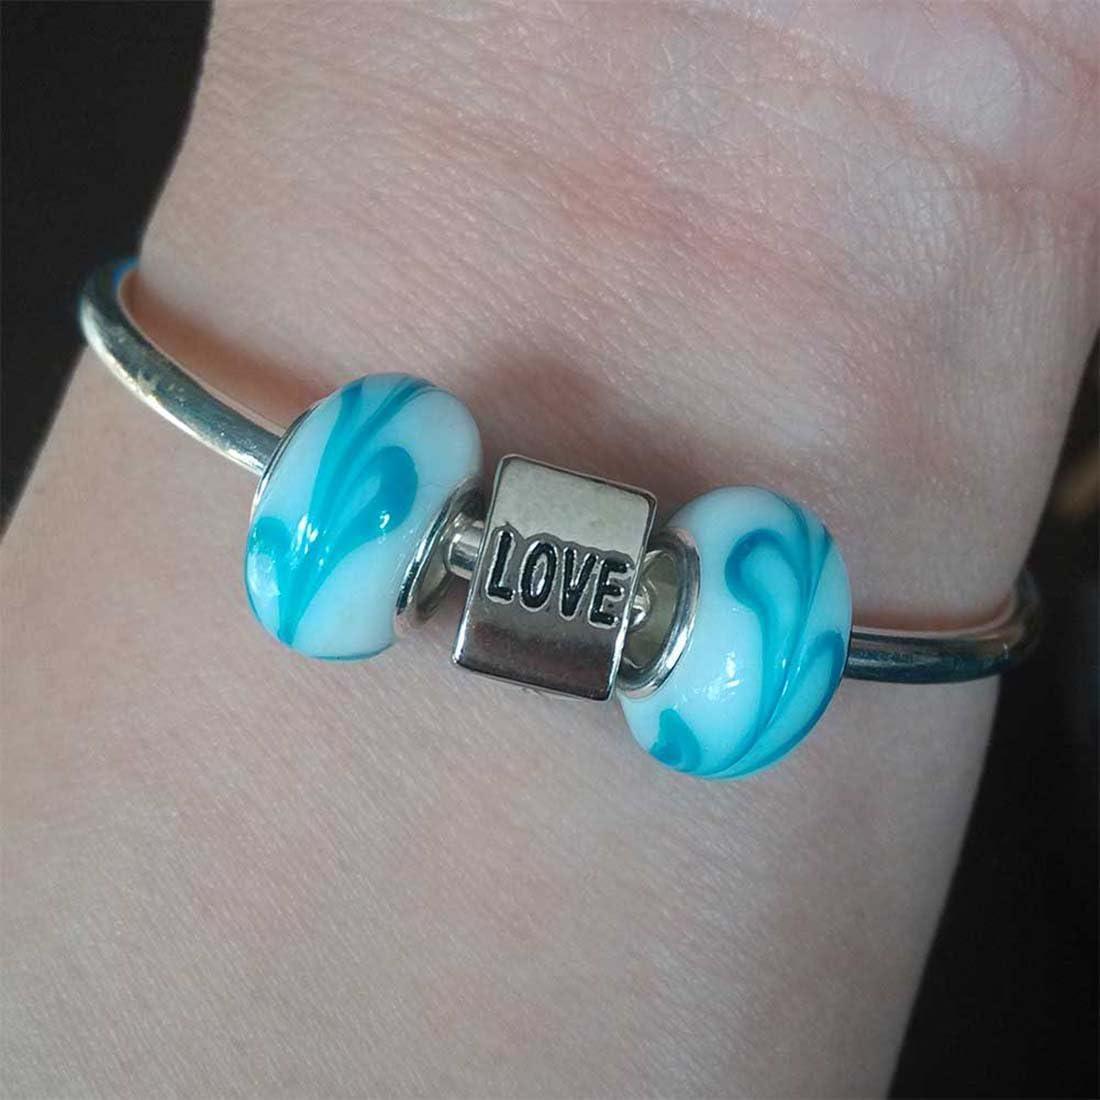 GiftJewelryShop Silver Plated Travel Egypt Pyramids Photo Love Charm Bead Bracelets European Bracelets